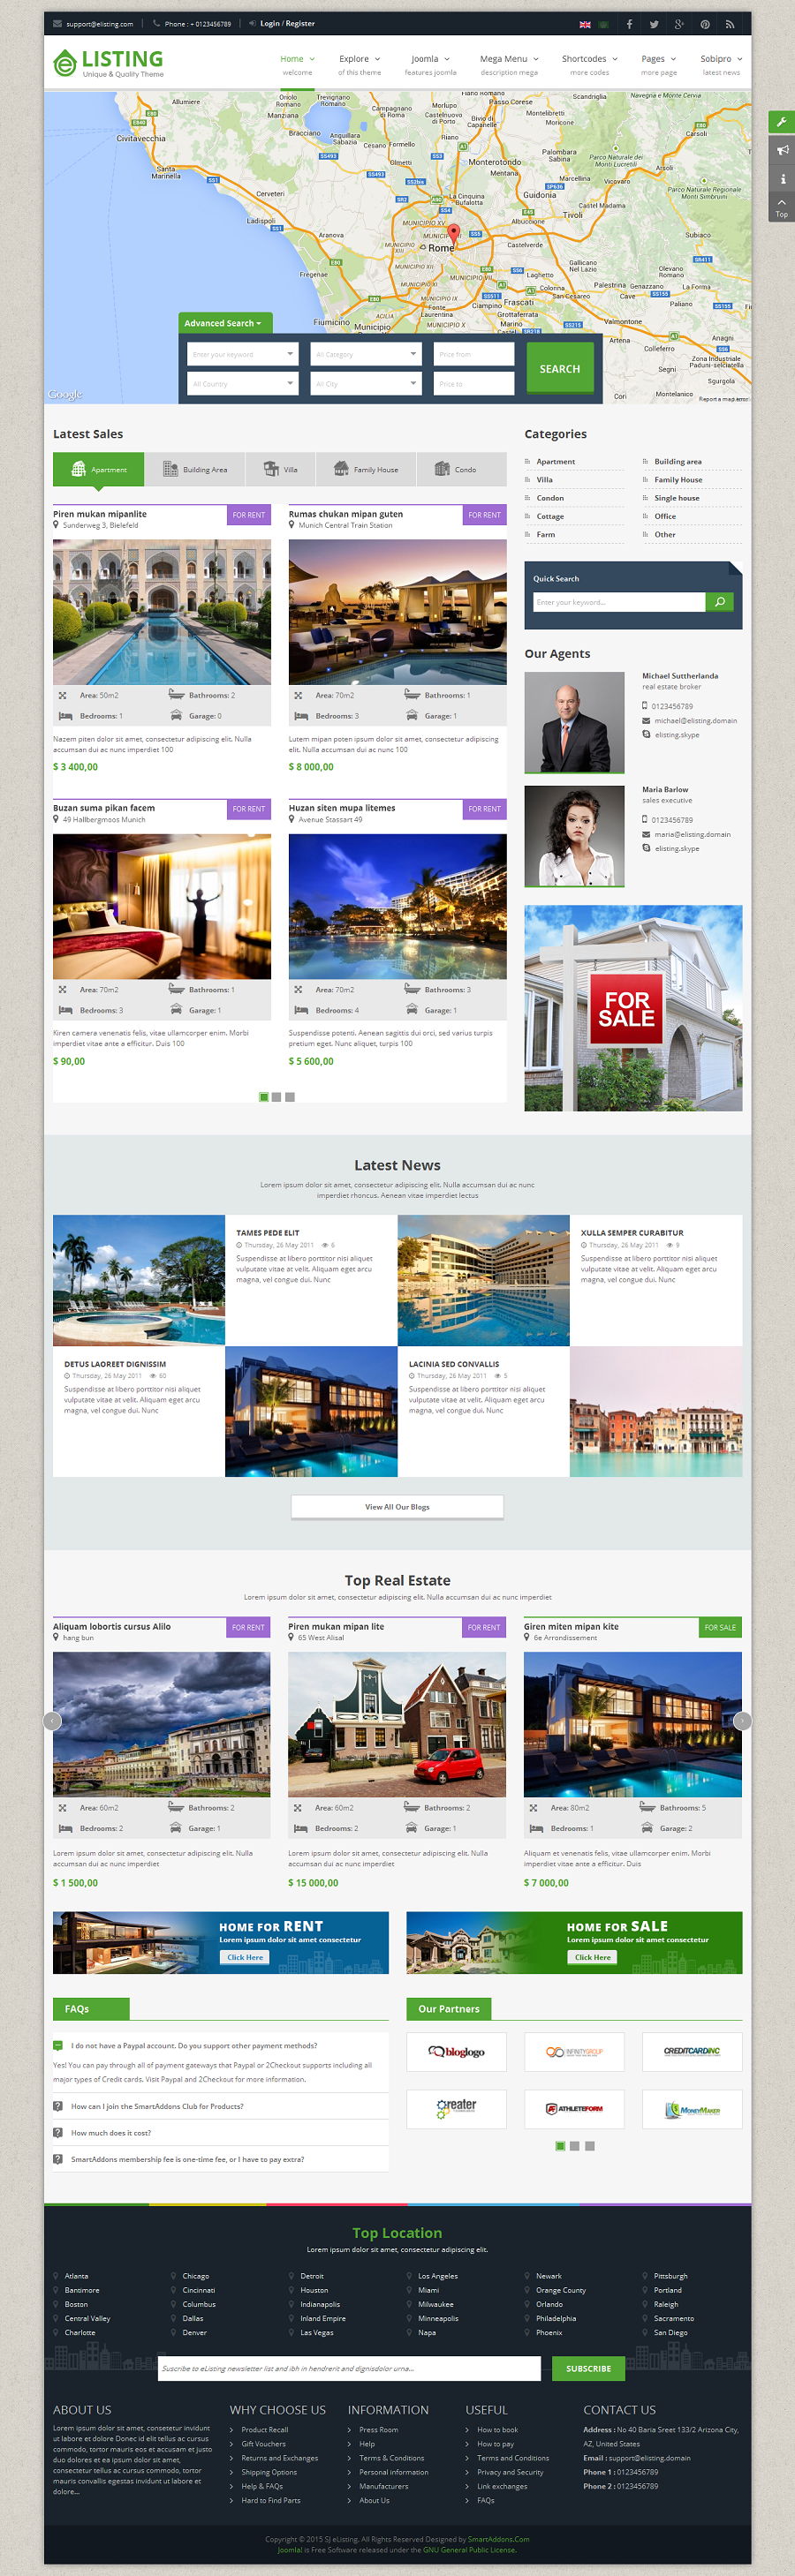 elisting responsive real estate joomla template by smartaddons elisting responsive real estate joomla template